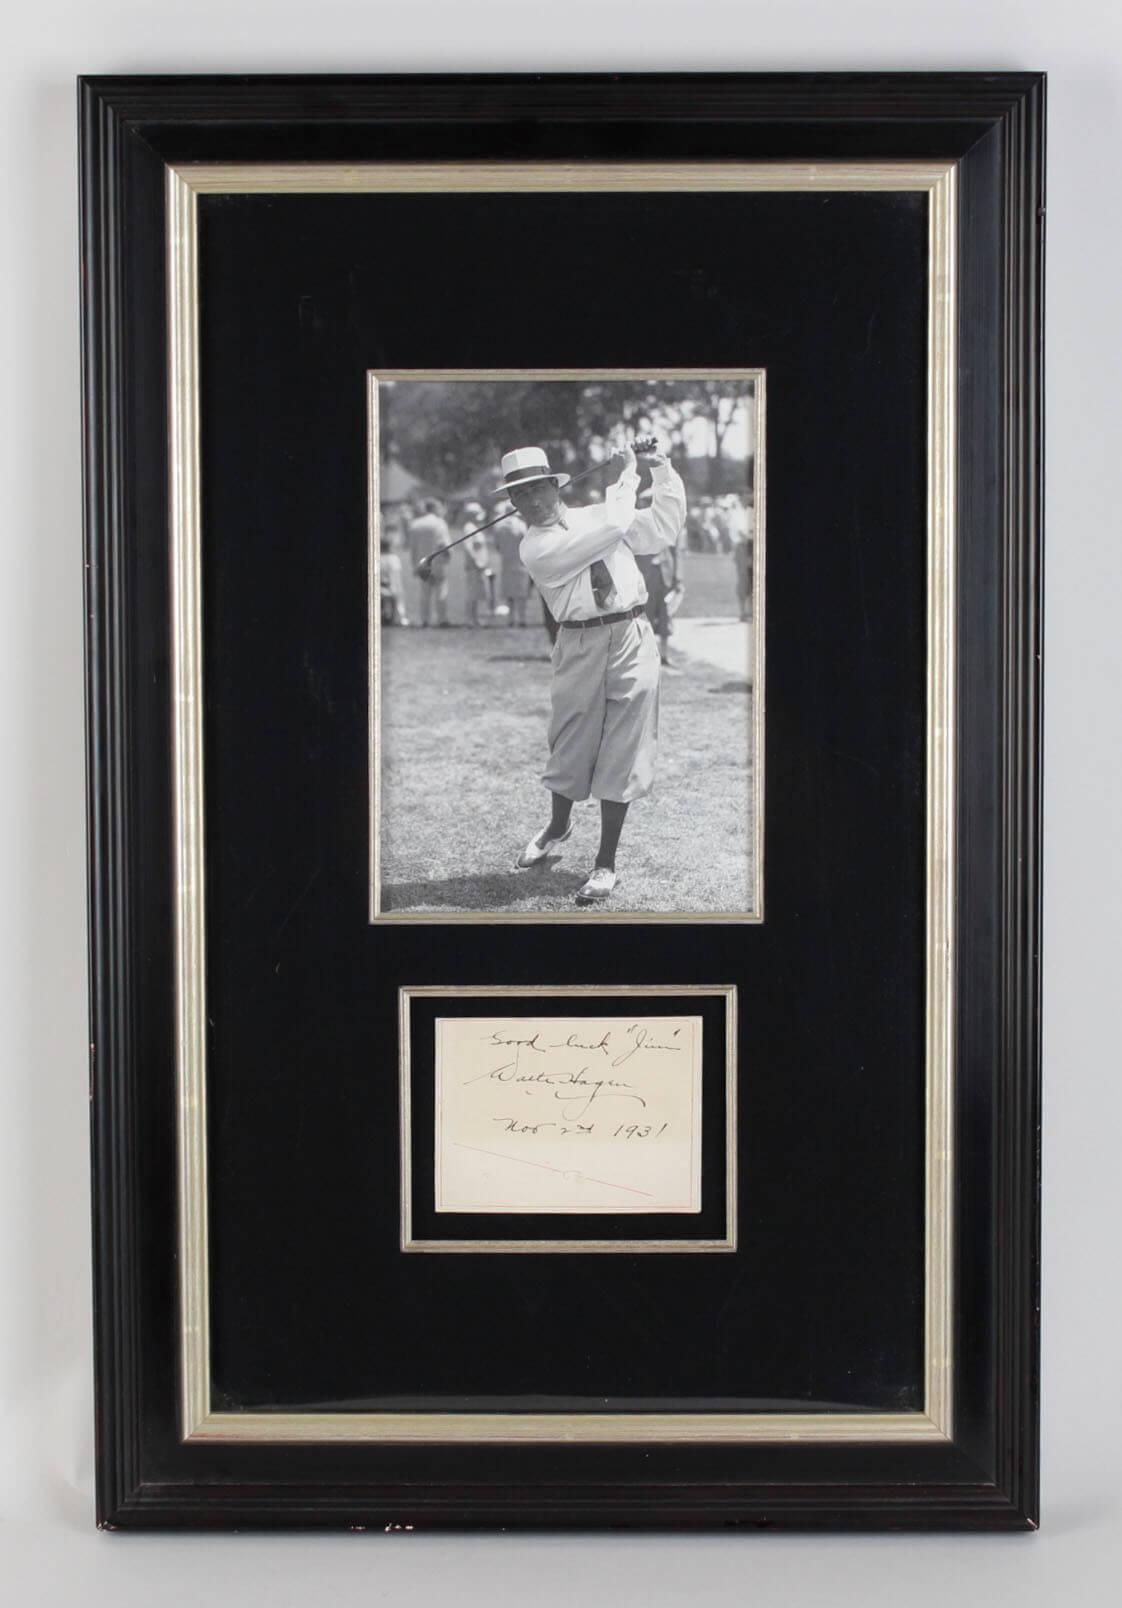 Golf Legend - Walter Hagen Signed, Inscribed & Dated Cut Display - JSA Full LOA